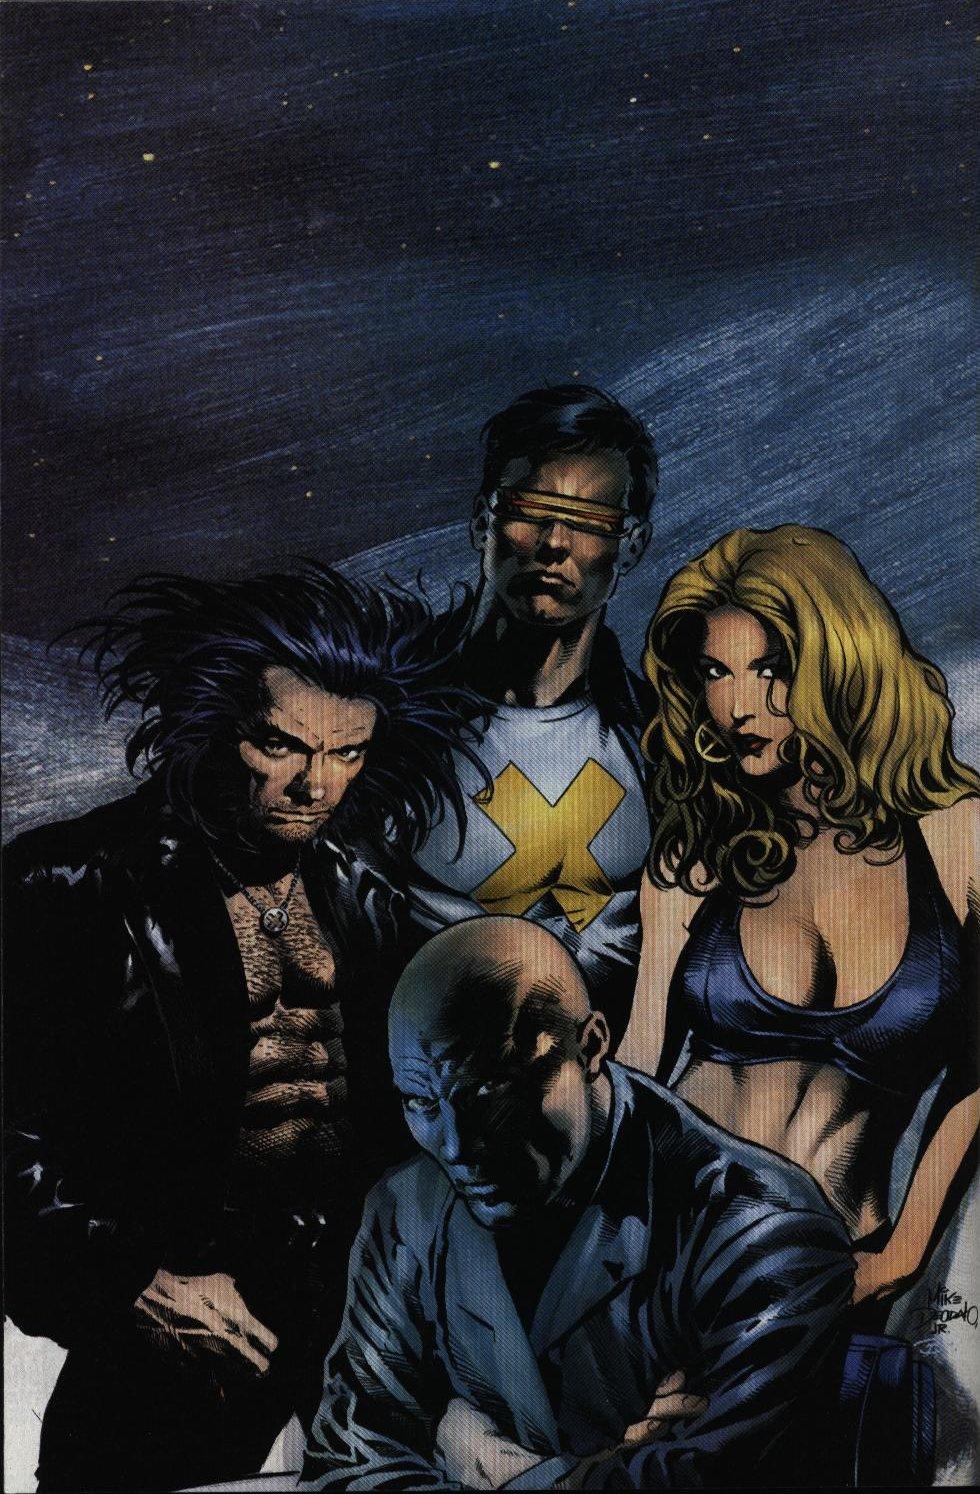 X-Men Unlimited Vol 1 34 Pinup 001.jpg